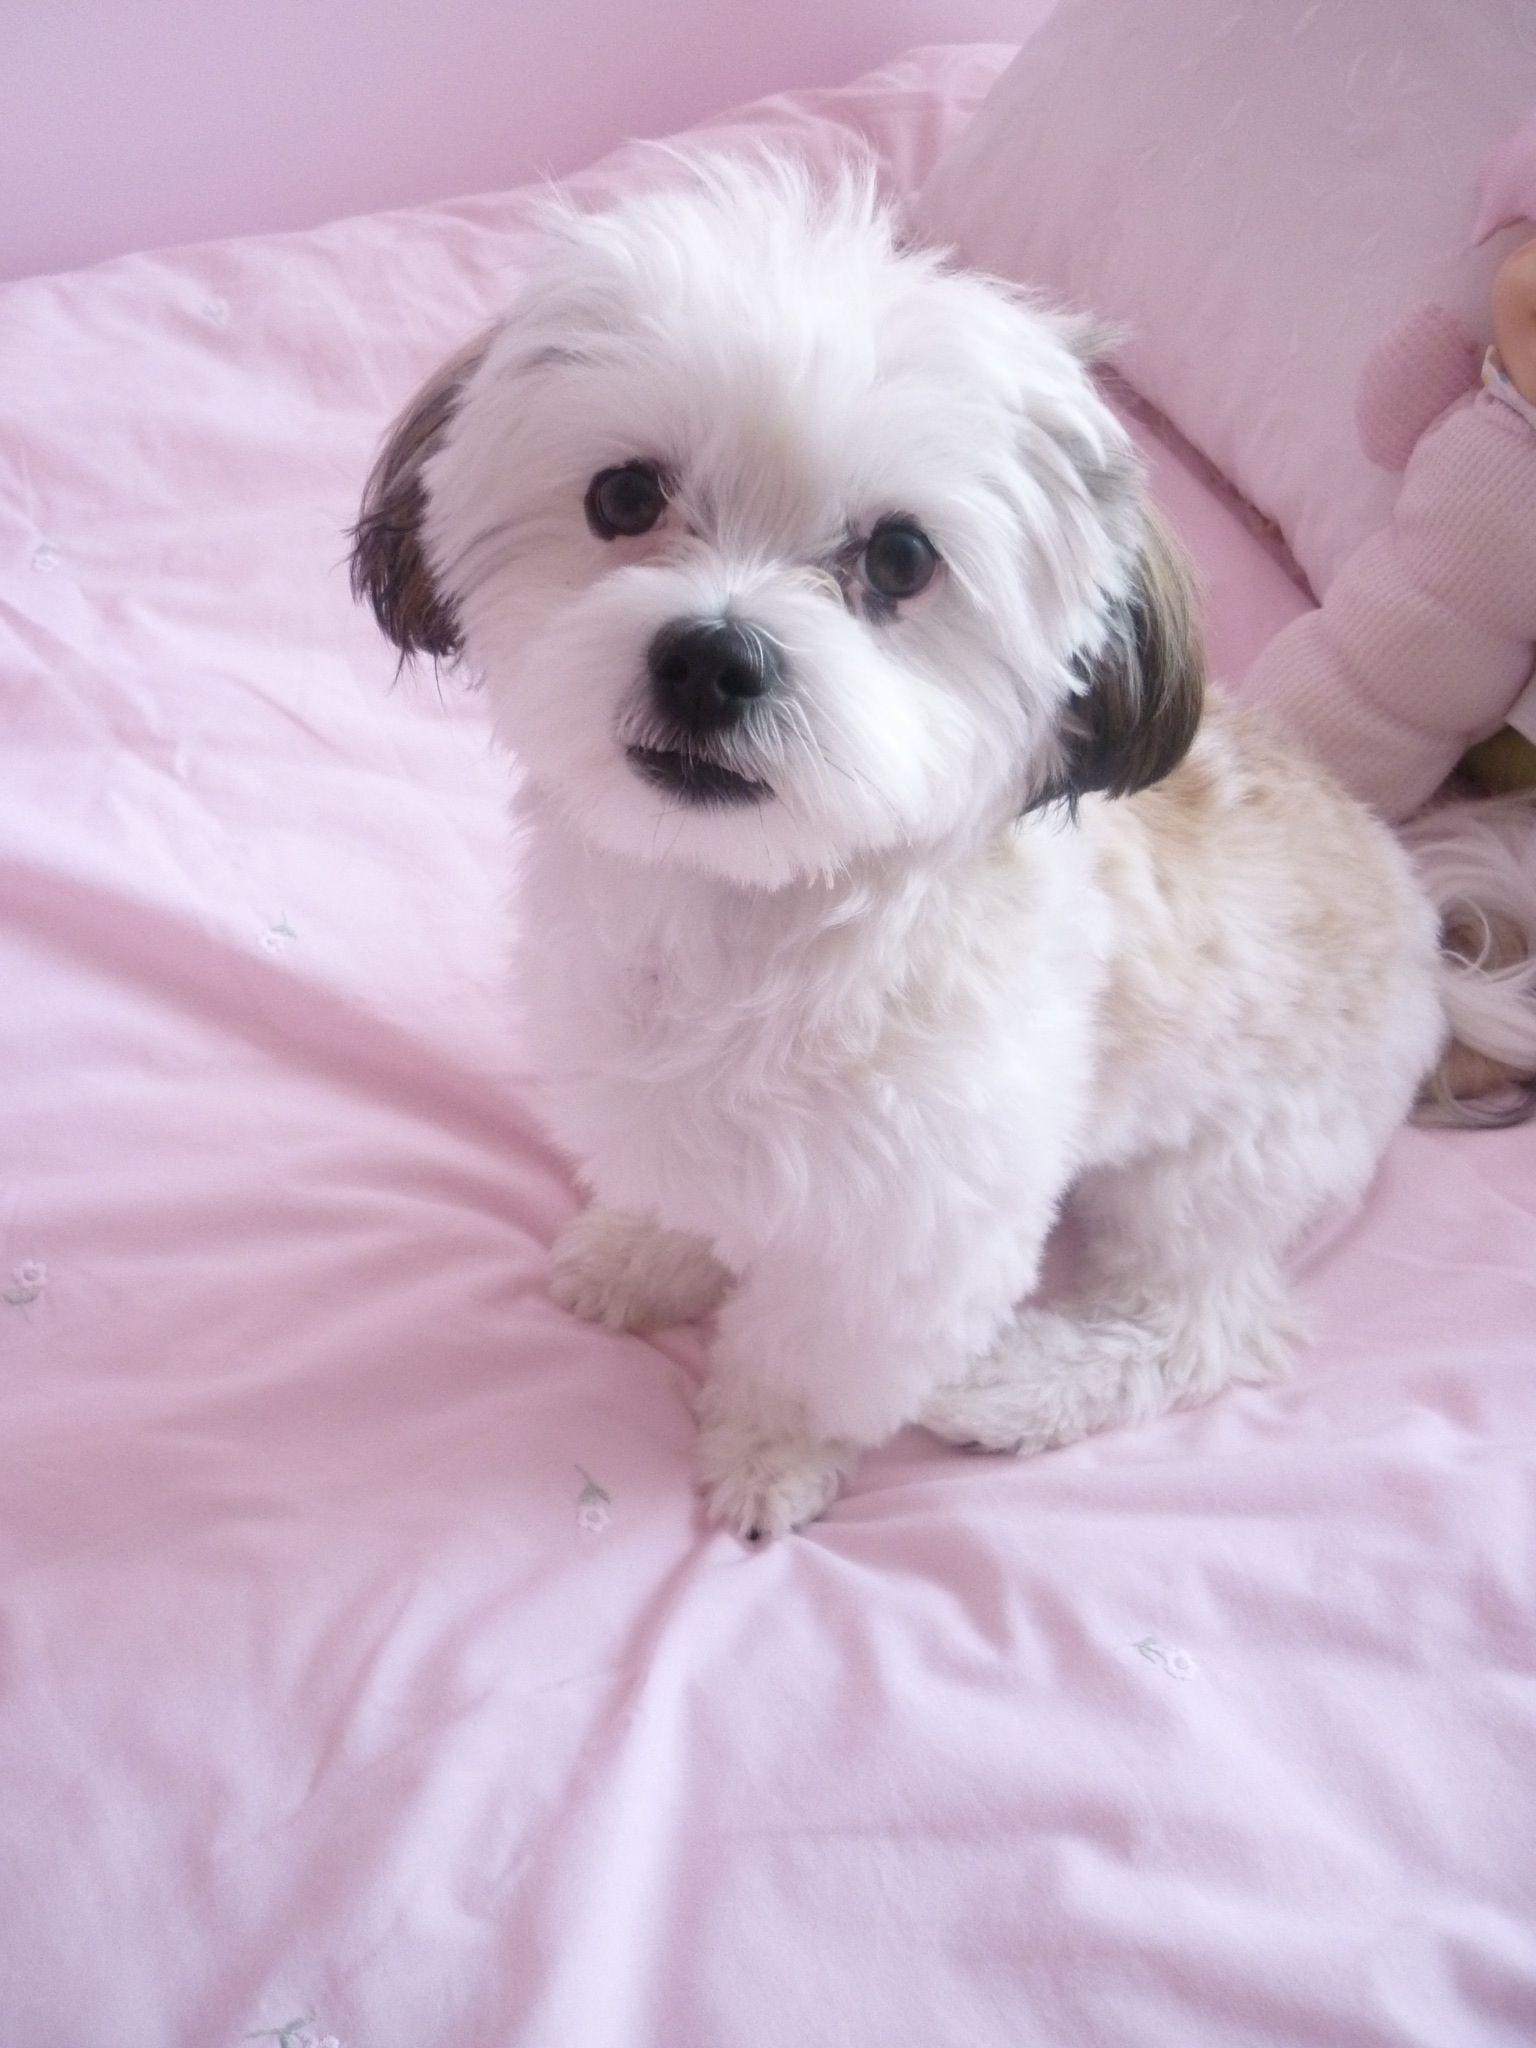 My Cute Maltese Shih Tzu Lap Dog Breeds Dogs Cute Dogs